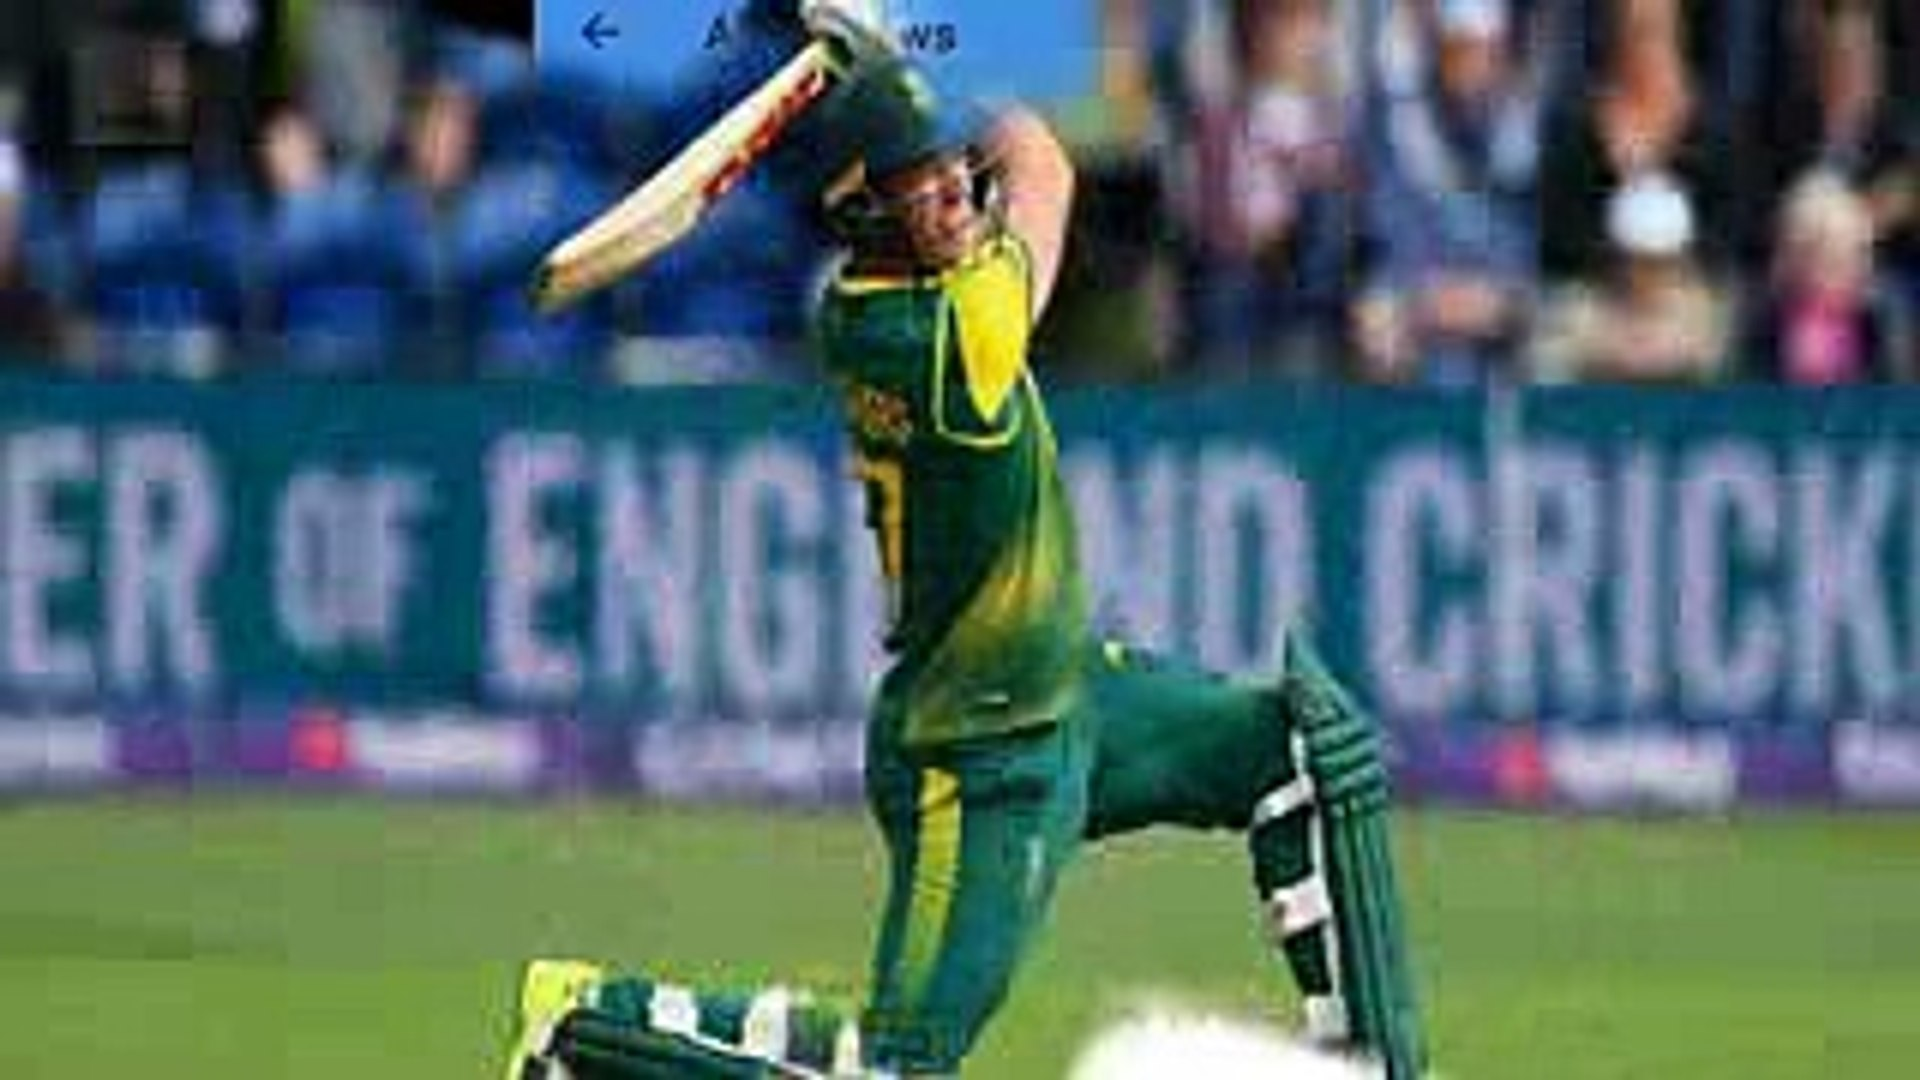 SA vs bangladesh  AB de villiers 176 off 104 balls against bangladesh  7 six & 15 four